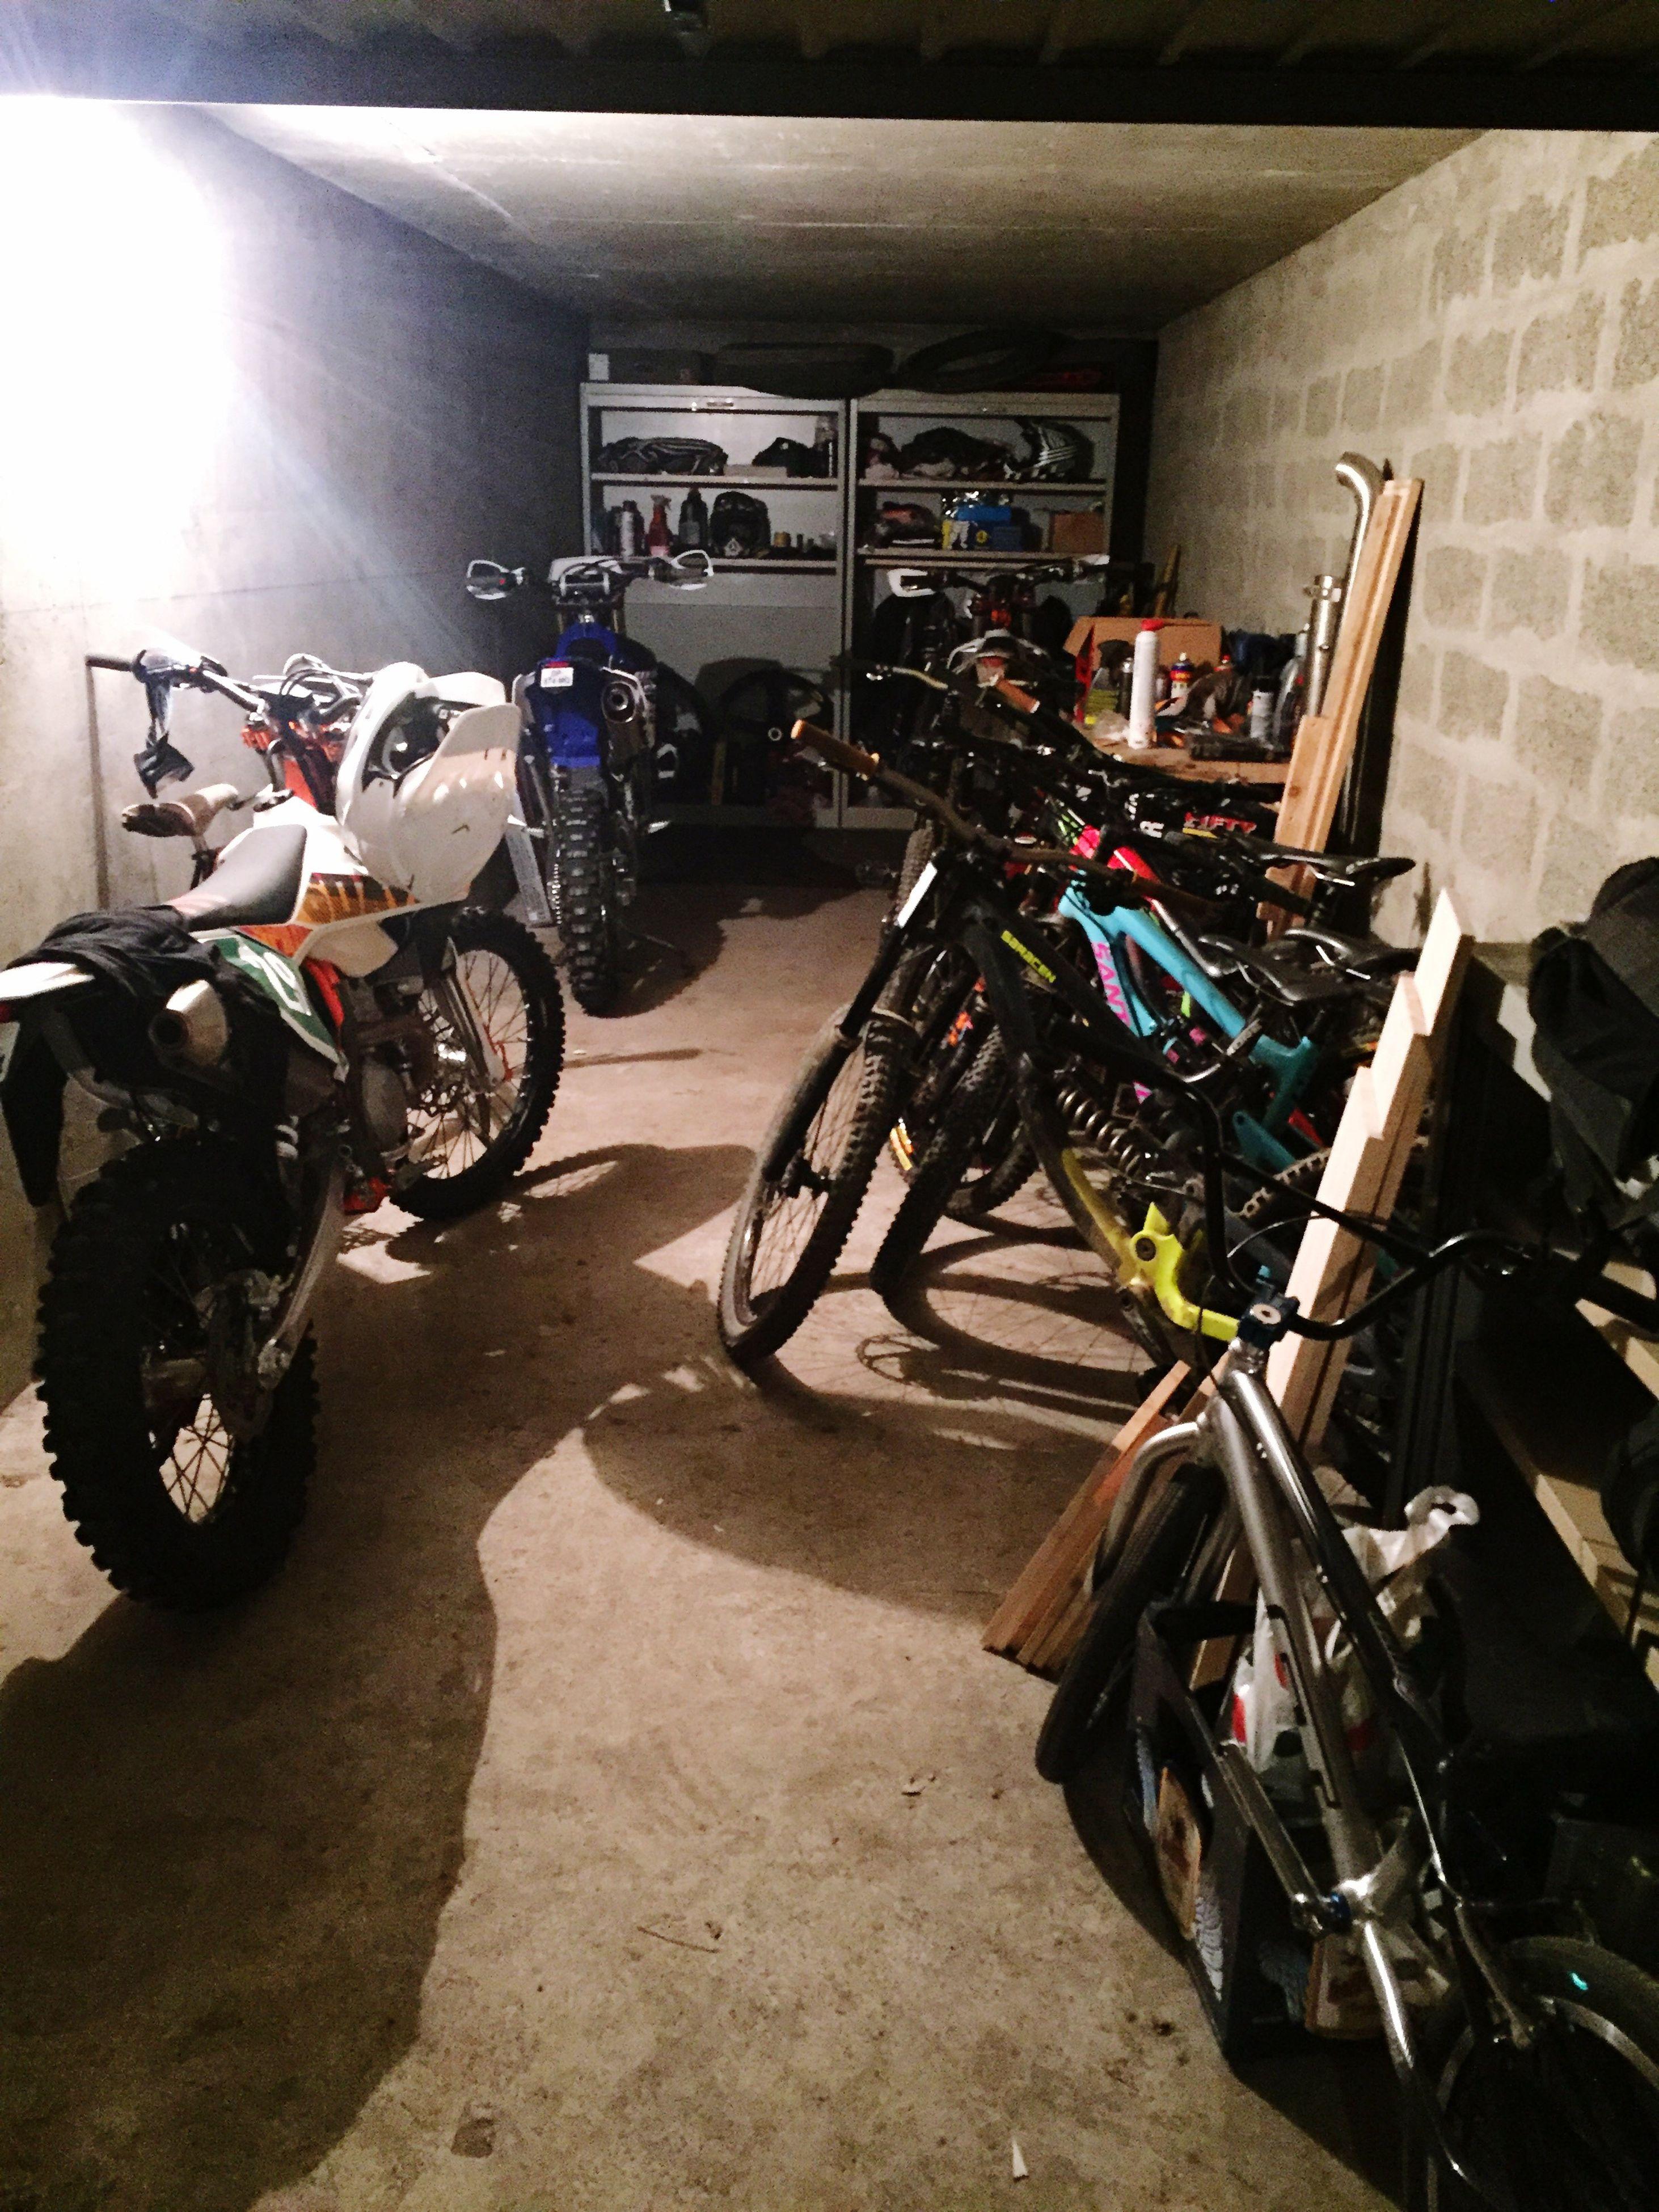 transportation, motorcycle, bicycle, stationary, mode of transport, land vehicle, outdoors, illuminated, day, no people